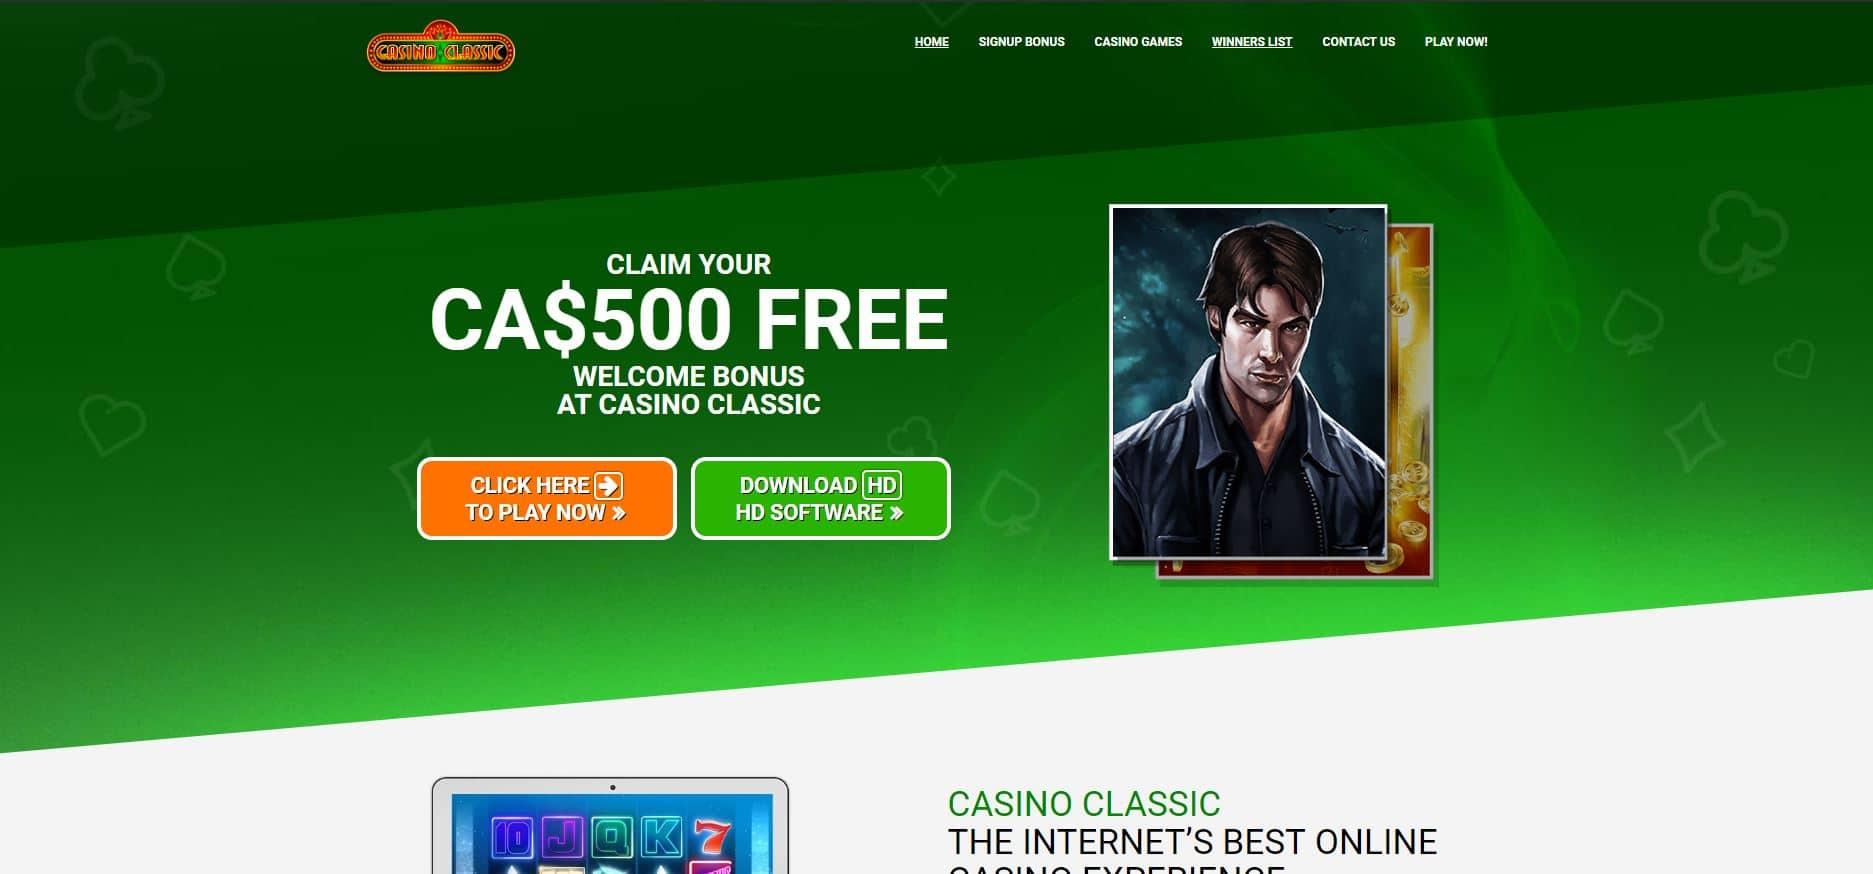 casino online holland casino